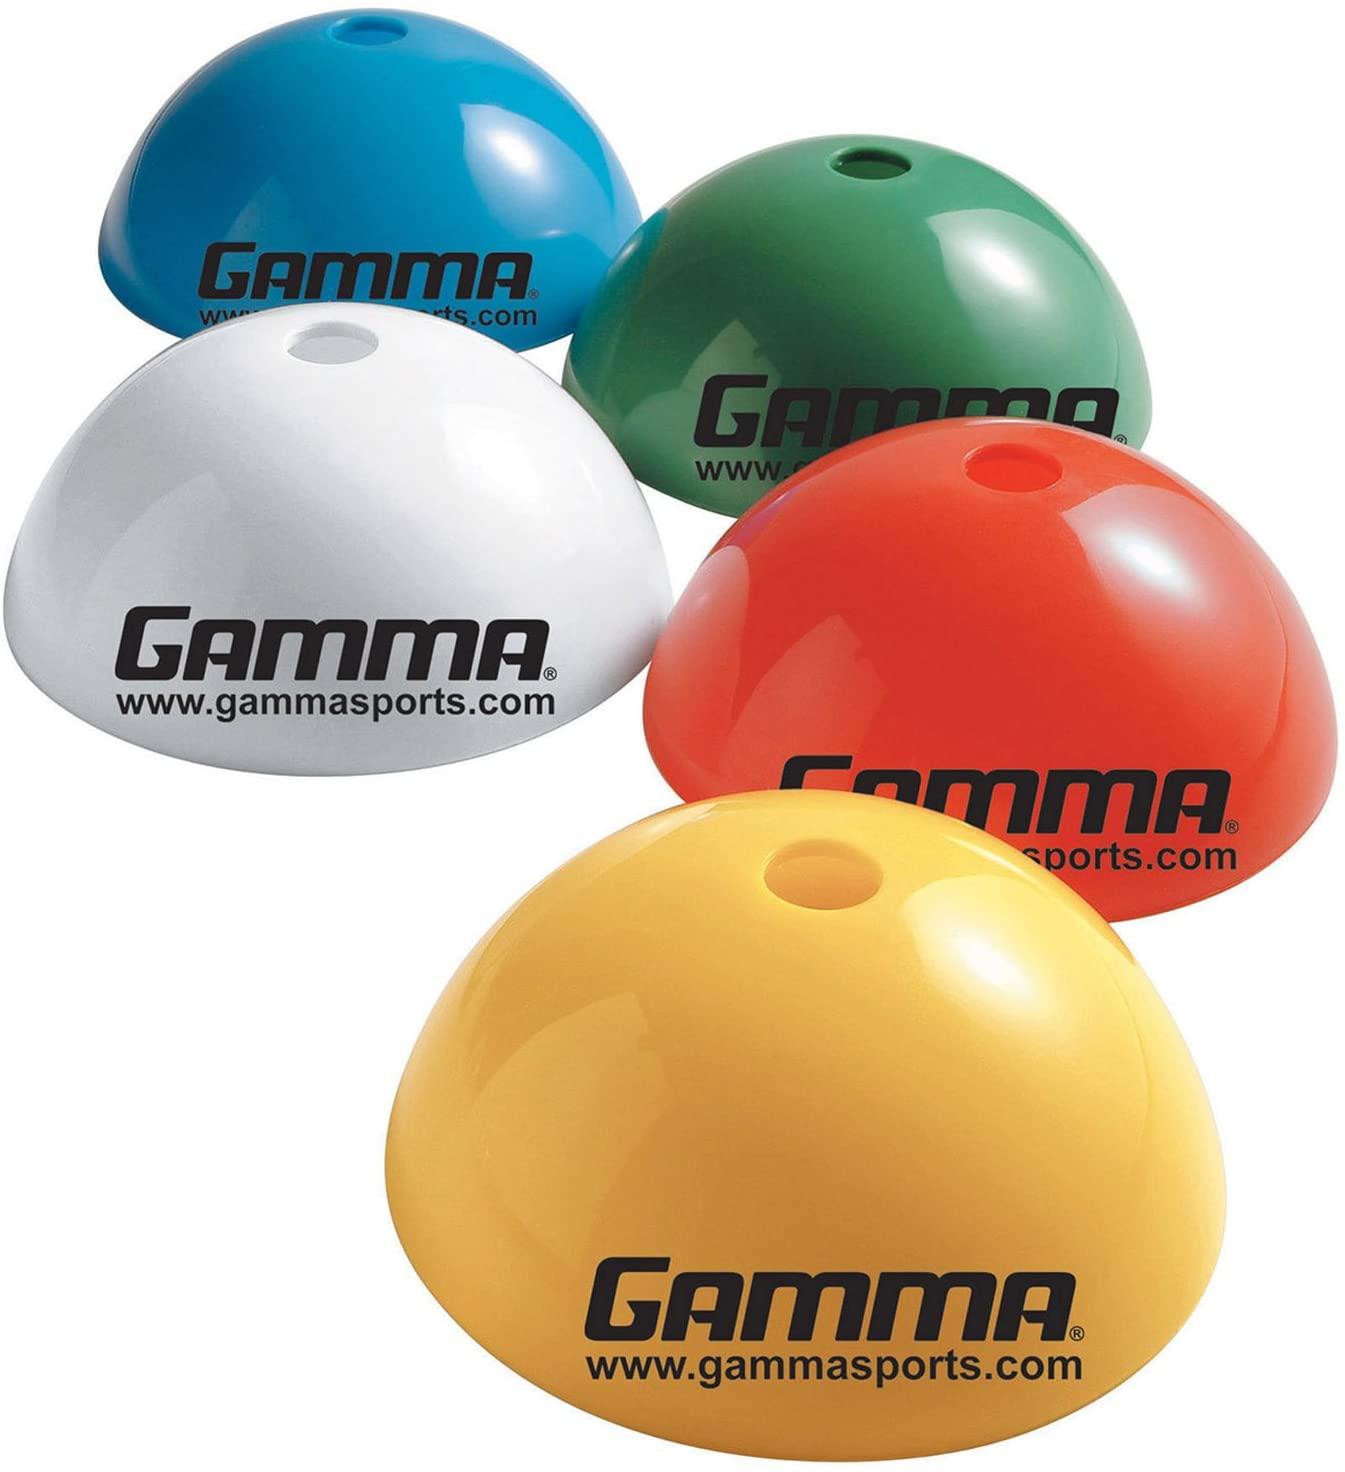 Gamma Rigid Dome Cones (pack of 5) assorted color